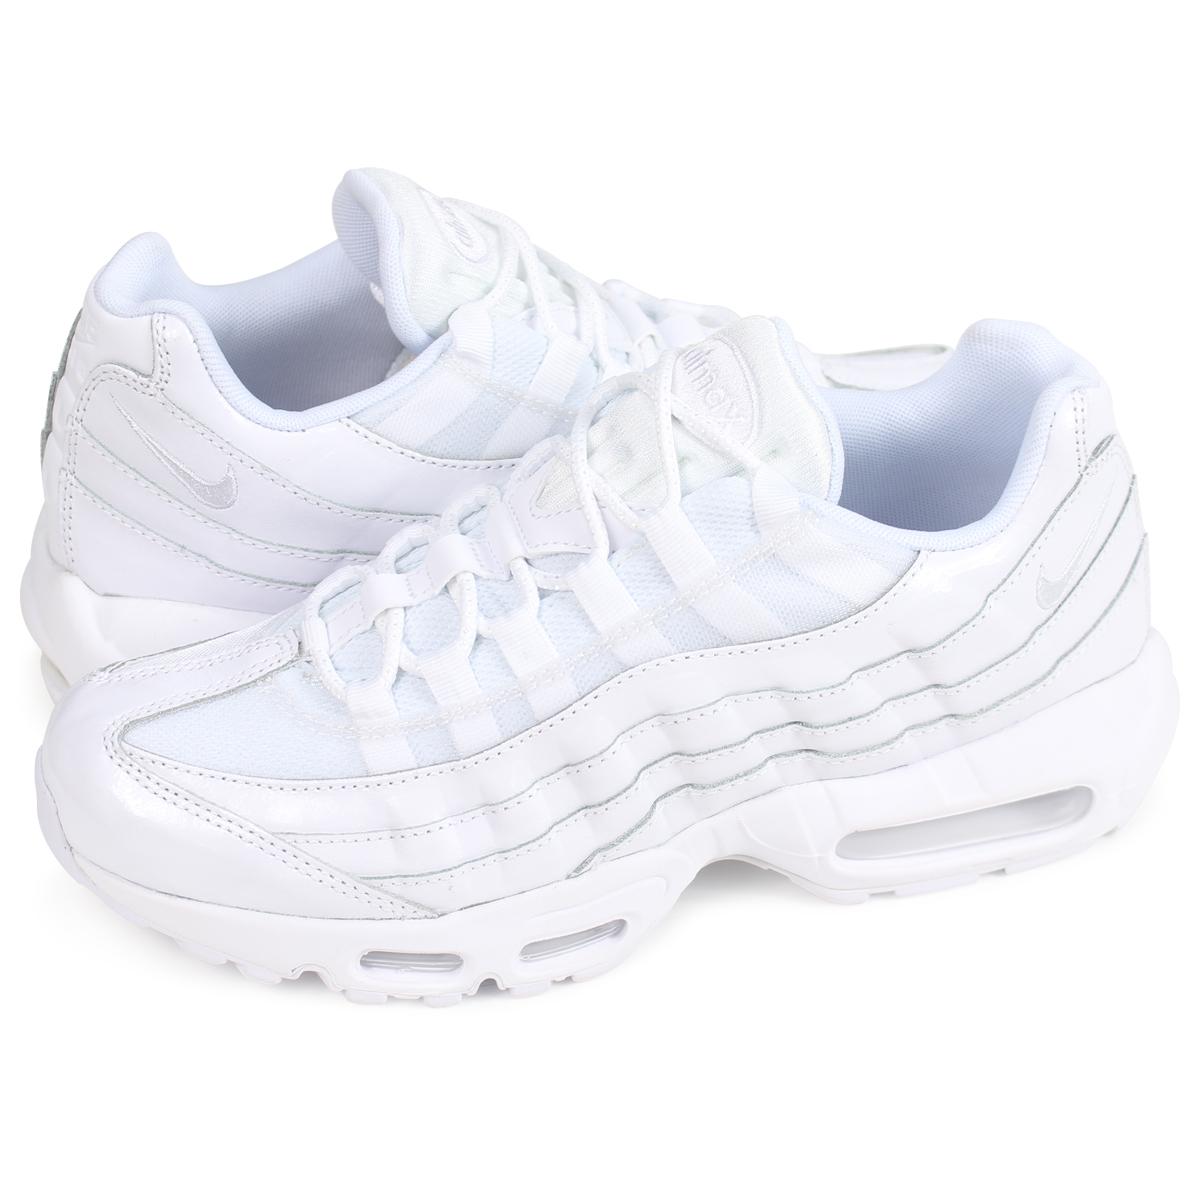 Nike NIKE Air Max 95 sneakers Lady's men WMNS AIR MAX 95 307,960 108 white white